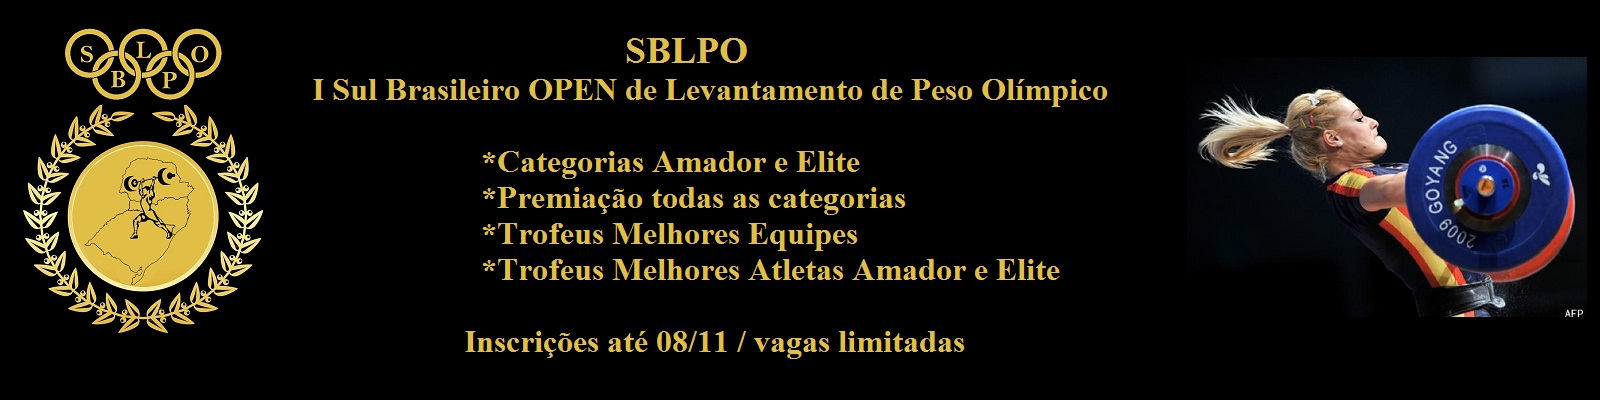 I SUL BRASILEIRO OPEN DE LEVANTAMENTO  DE PESO OLÍMPICO - SBLPO - Imagem de topo